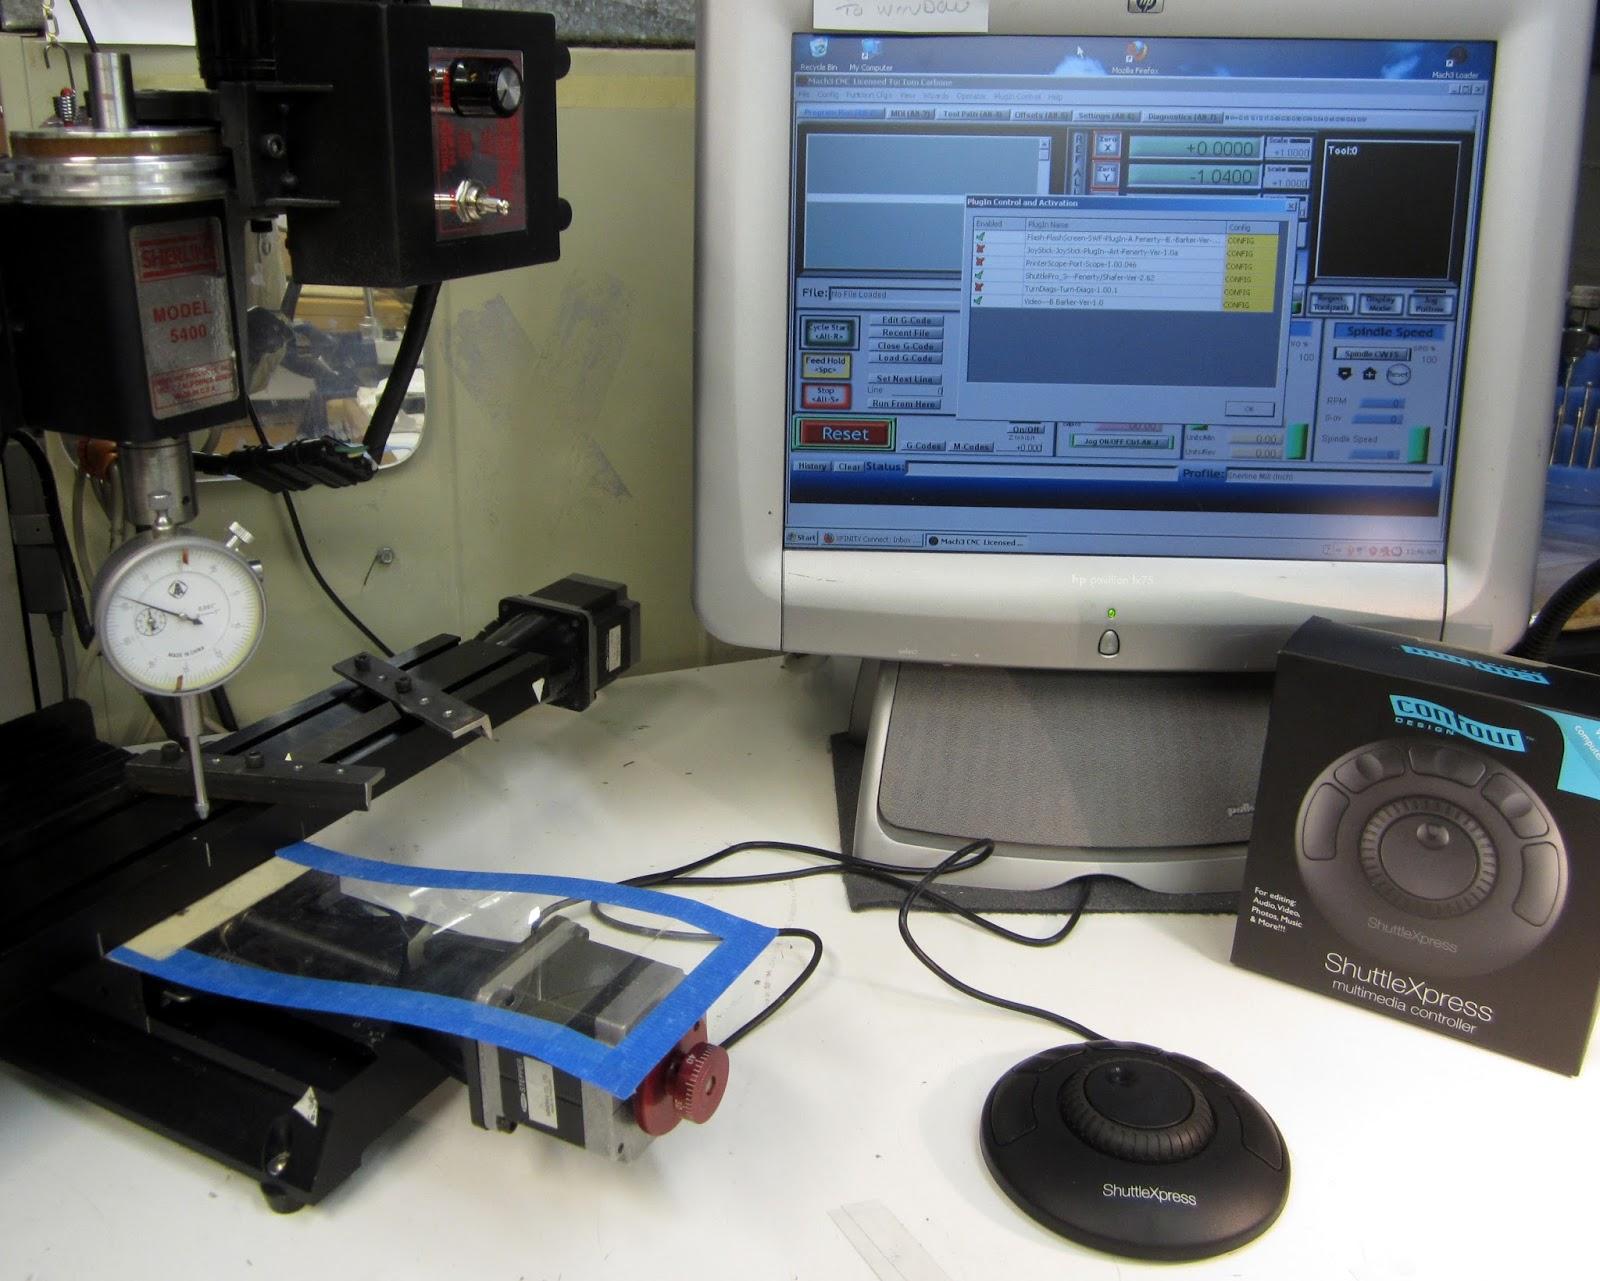 Mi Shop Tools Inventions Sherline Cnc Mach3